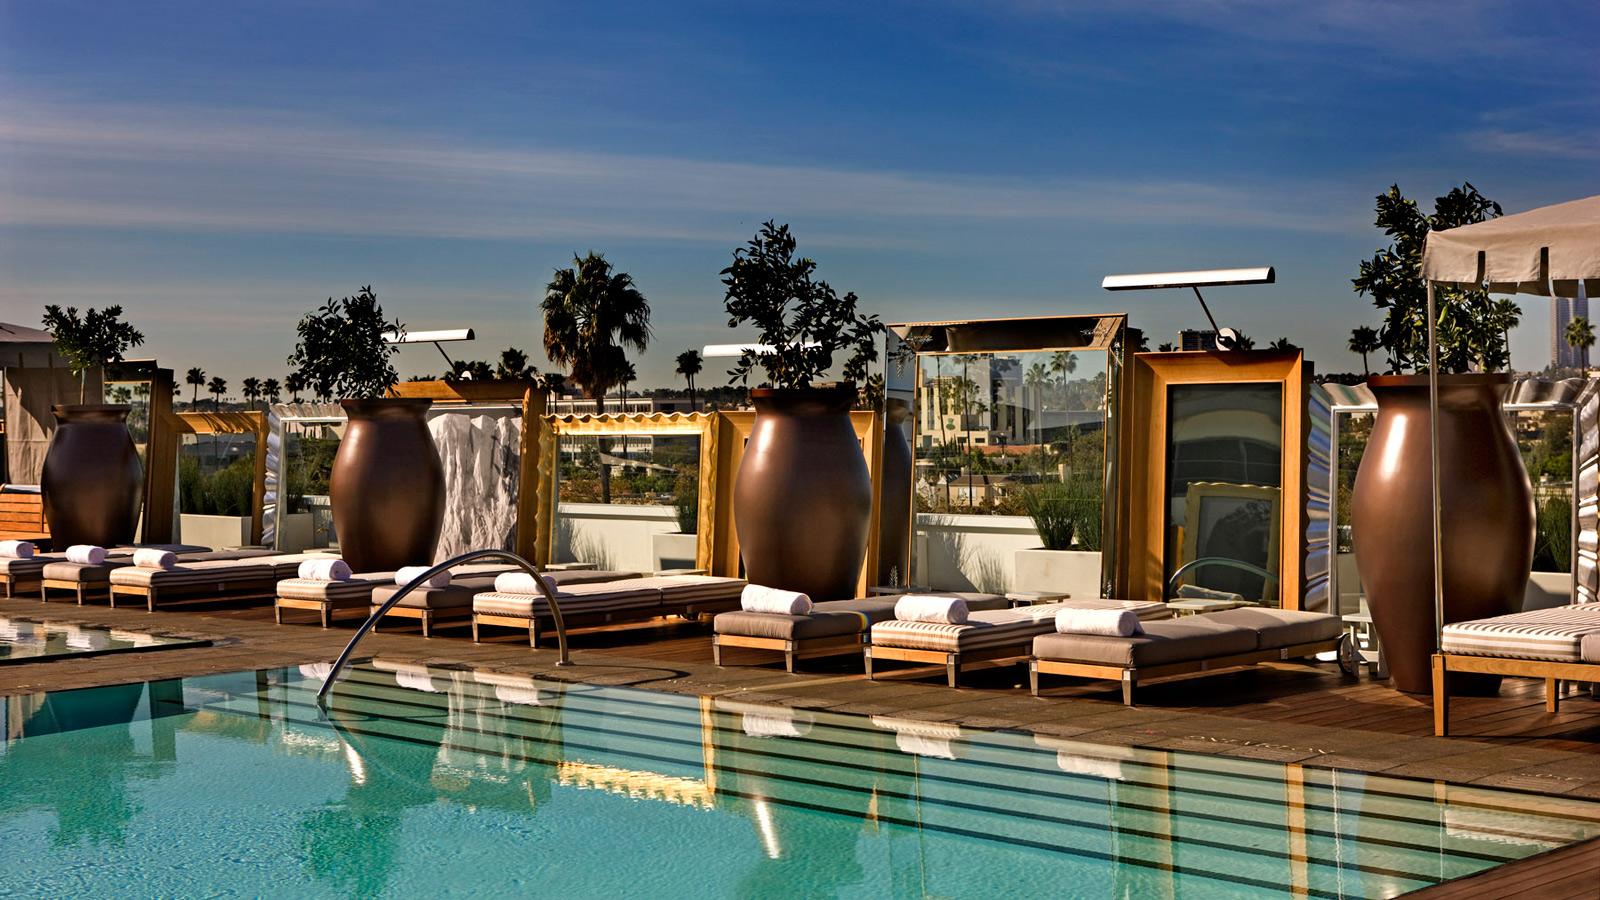 Los Angeles hotel pools: 6 that will make a real splash | CNN Travel